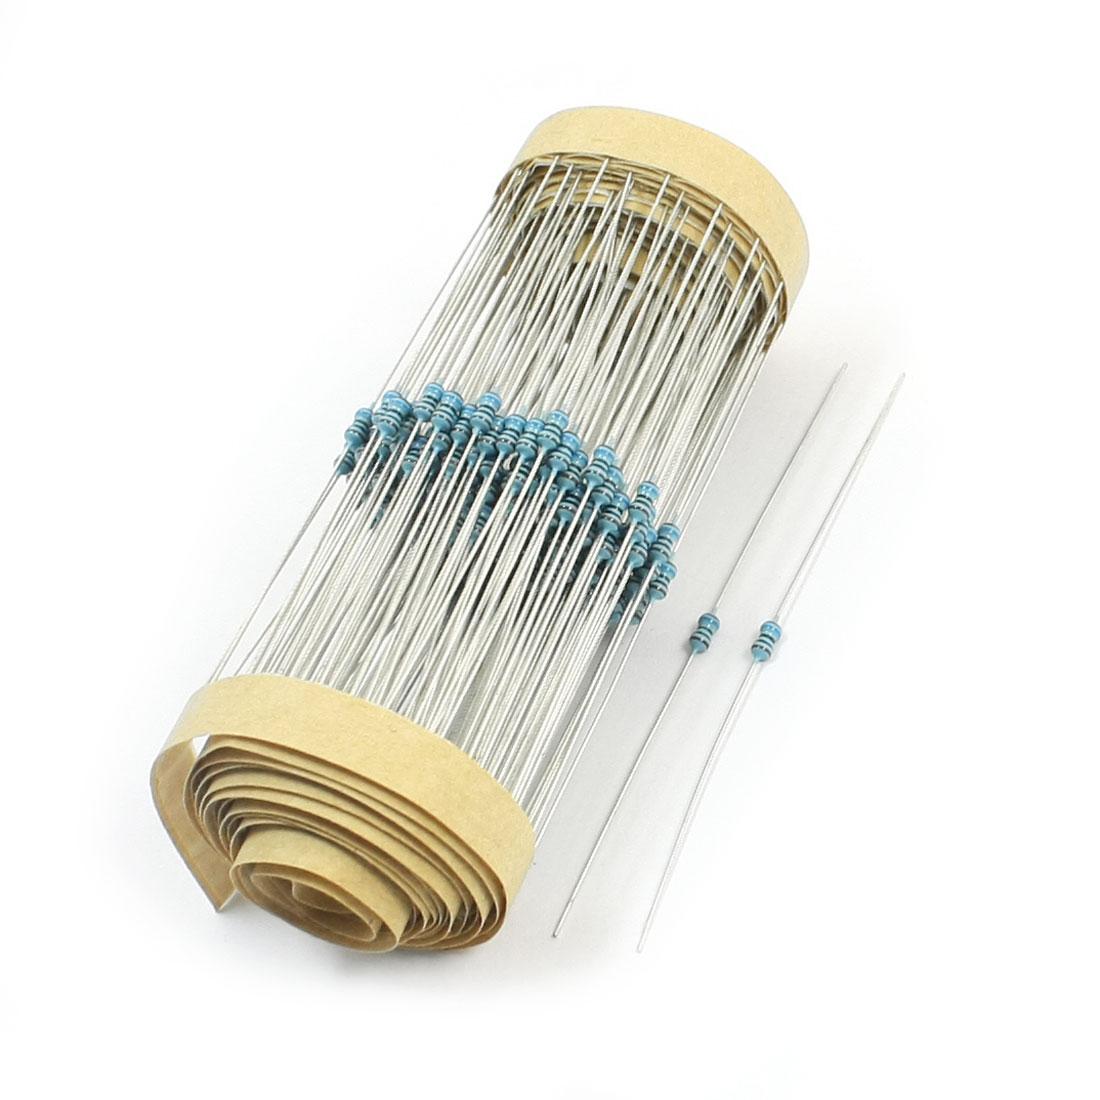 300pcs 3x2mm Body 1/8W 1% 160 Ohm Axial Lead Metal Film Resistors